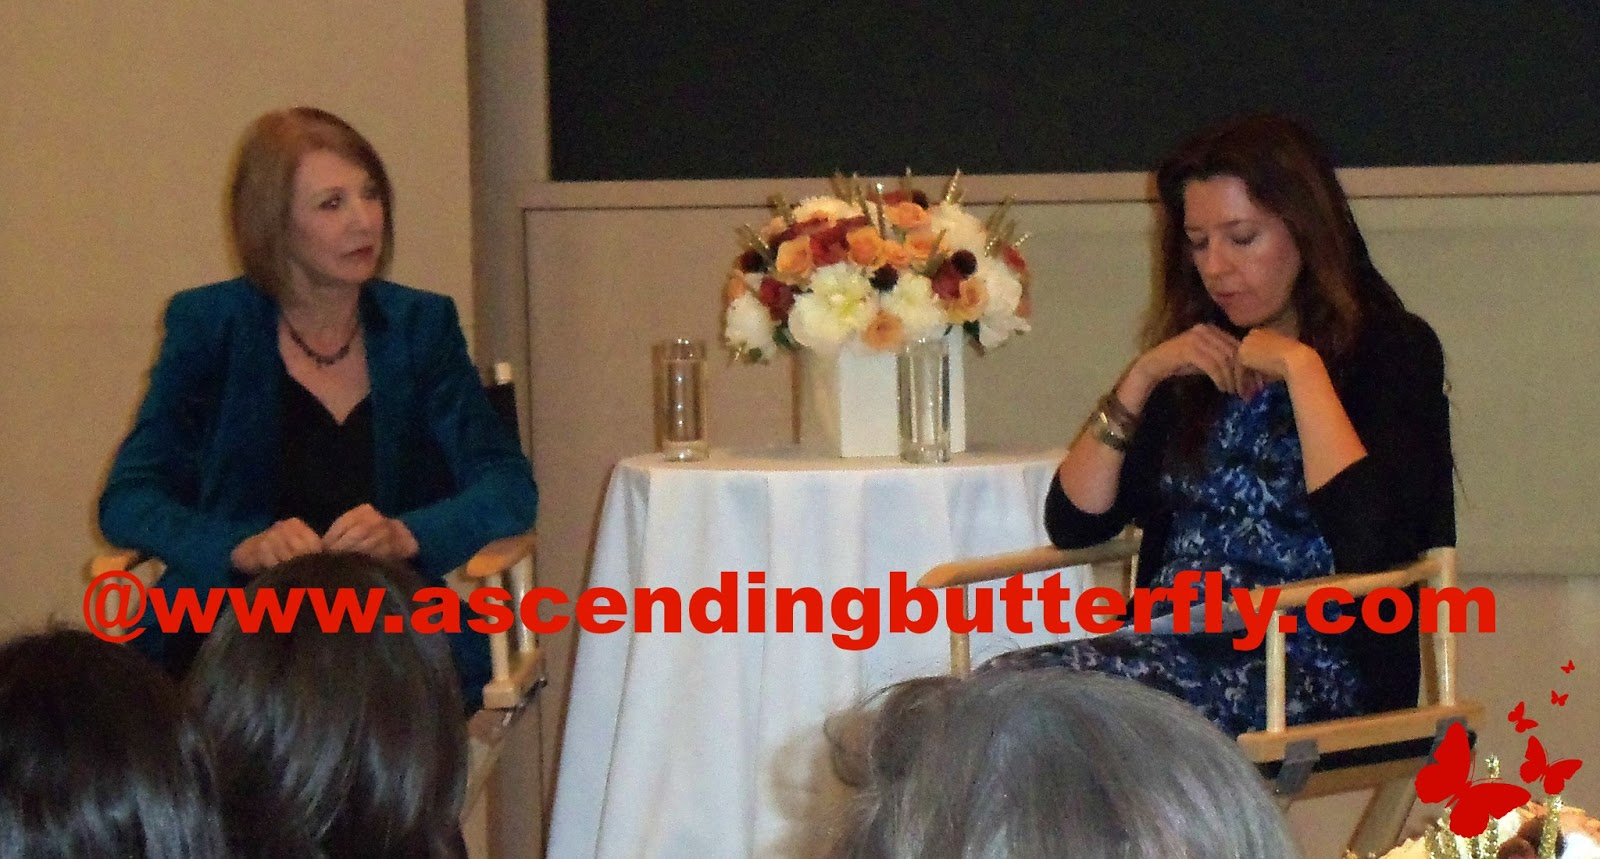 http://1.bp.blogspot.com/-d7Lp3-_DaCo/UO-QYkyOFvI/AAAAAAAAHFE/9j1RW3D8EGg/s1600/Jane+Iredale+Lucky+Magazine+Bloggers+Luncheon+AB03+WATERMARKED.jpg